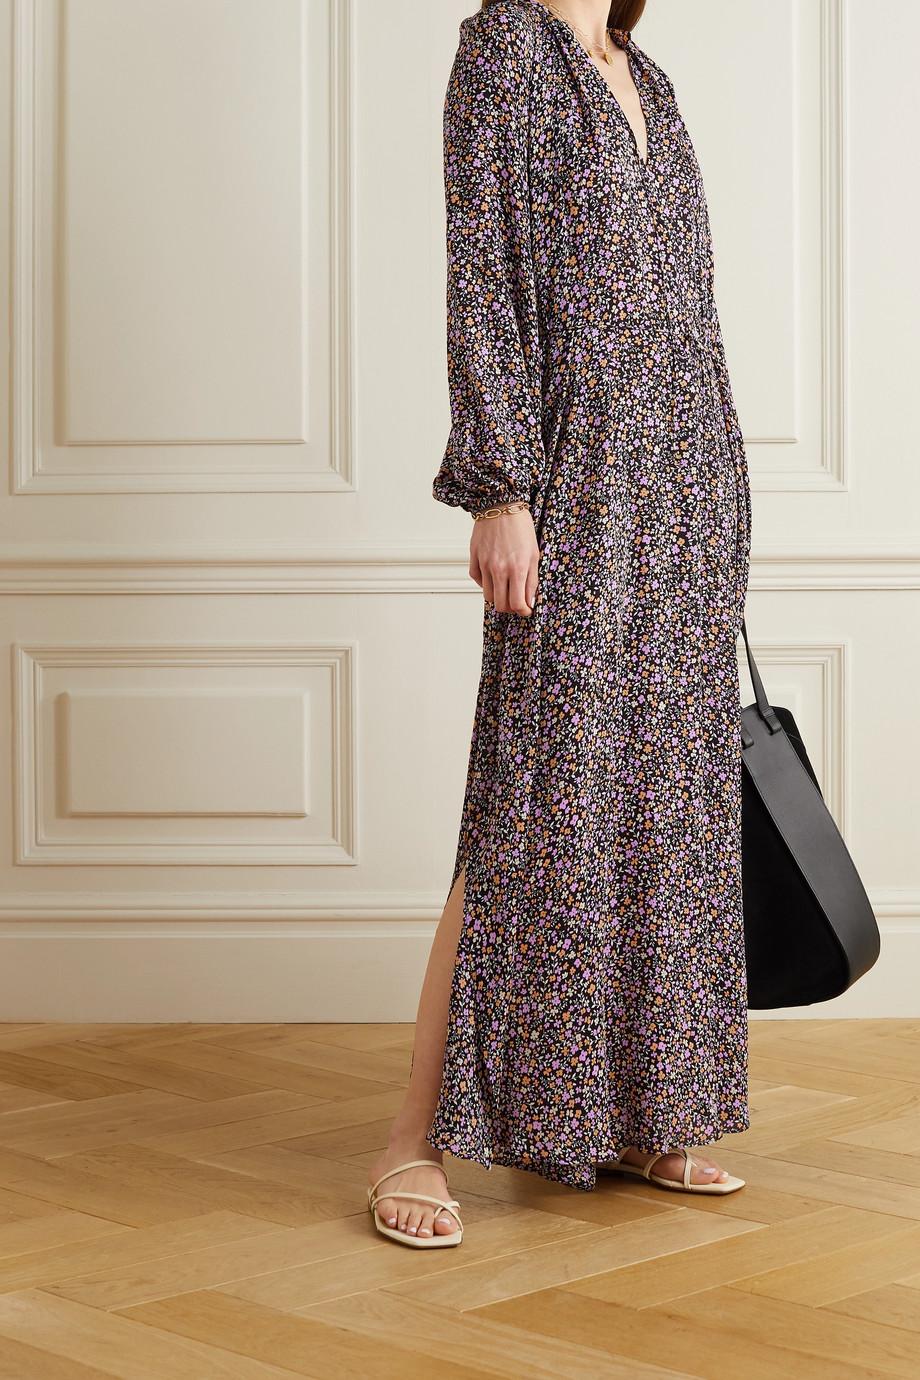 Matteau + NET SUSTAIN floral-print silk maxi dress